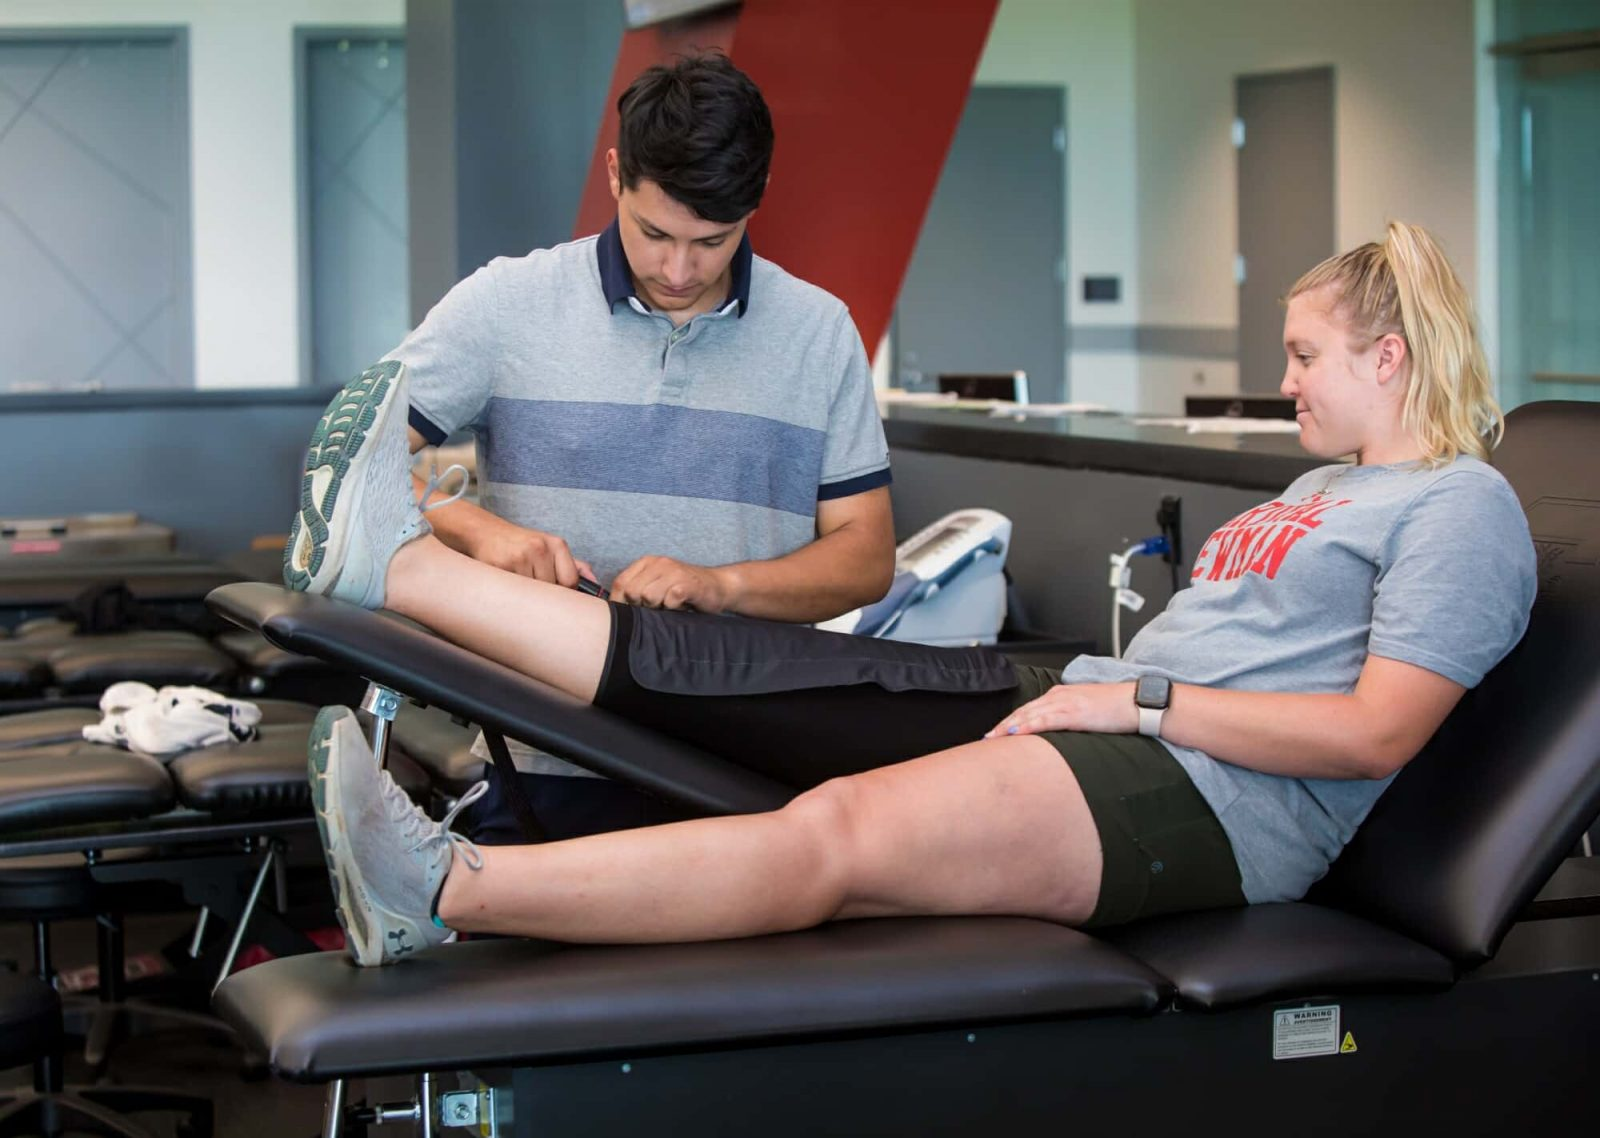 Rehabilitation Trainer and Patient